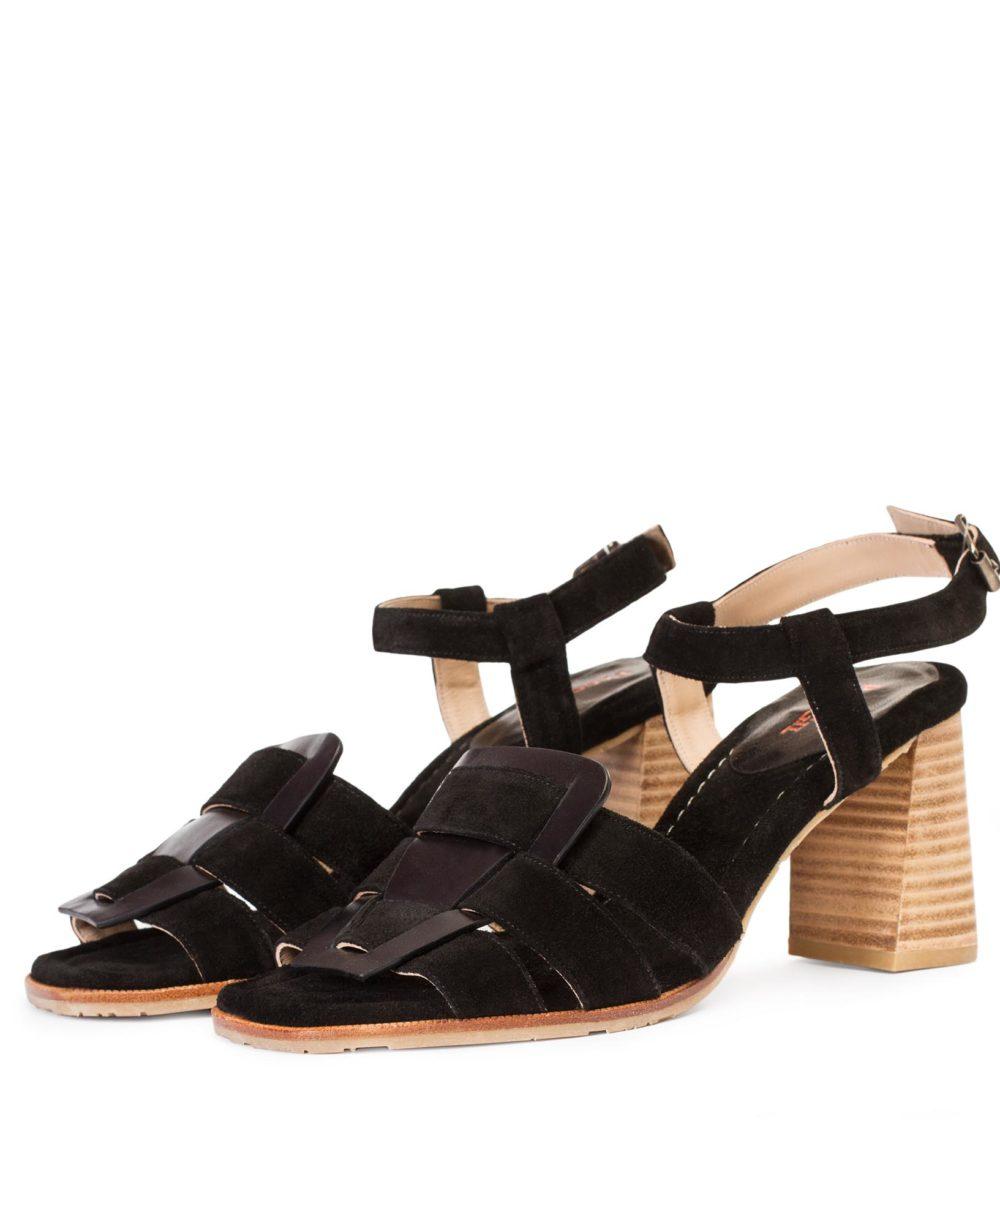 P-3931 Black Madison Velour Leather Sandals by Paco Gil par